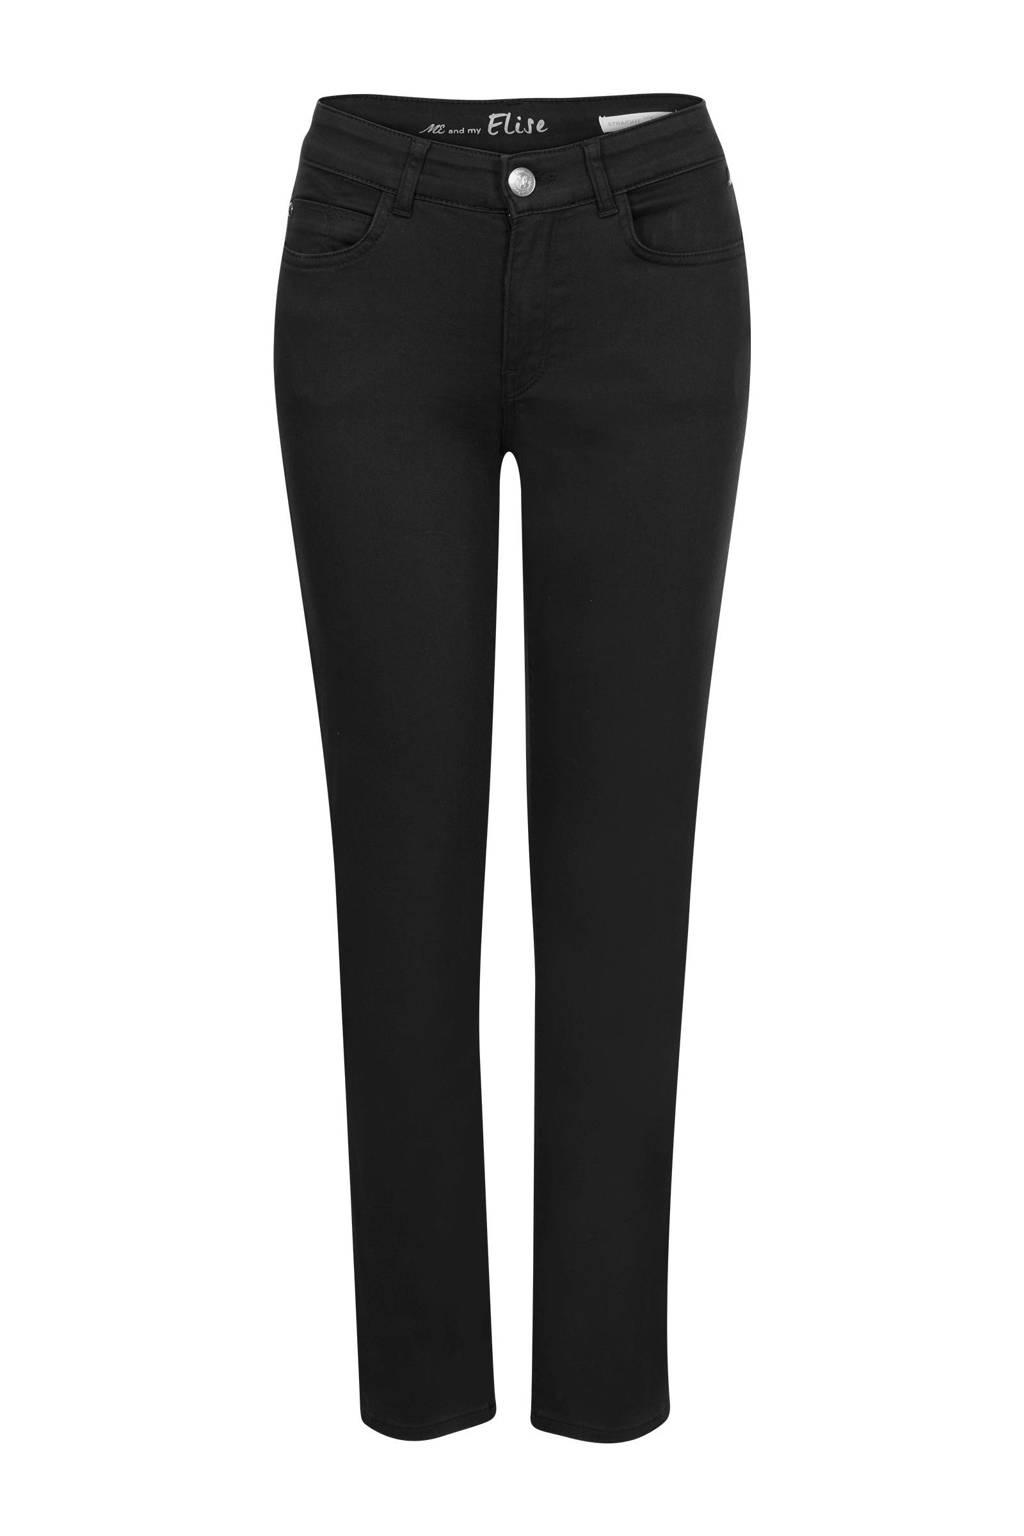 Miss Etam Regulier slim fit jeans Elise 28 inch zwart, Zwart